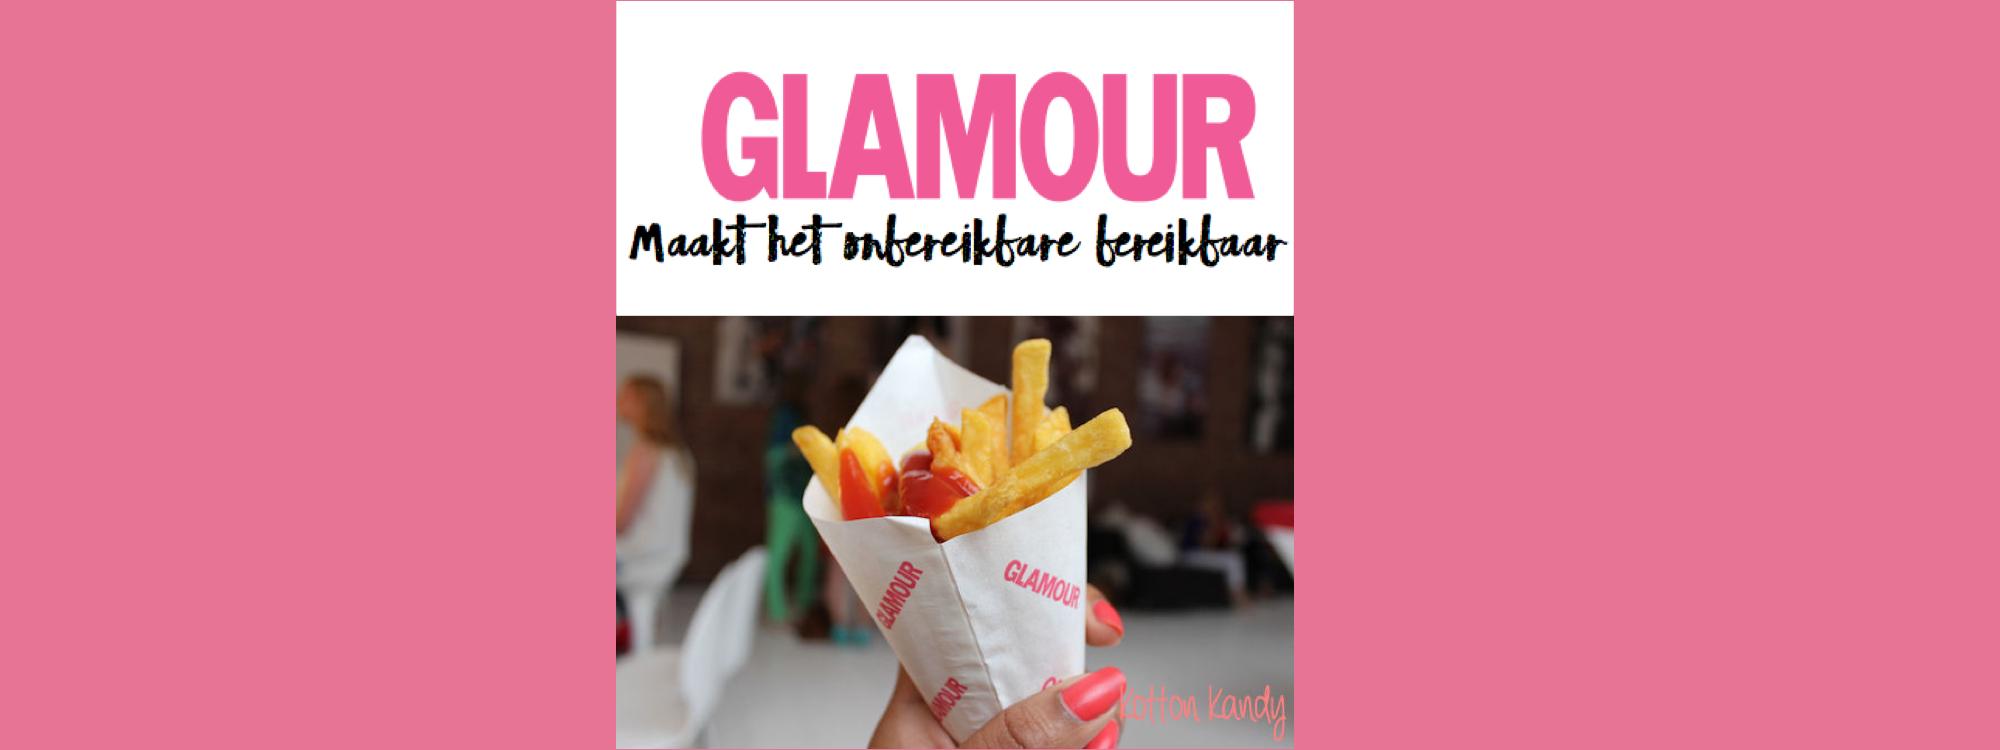 Glamour 3